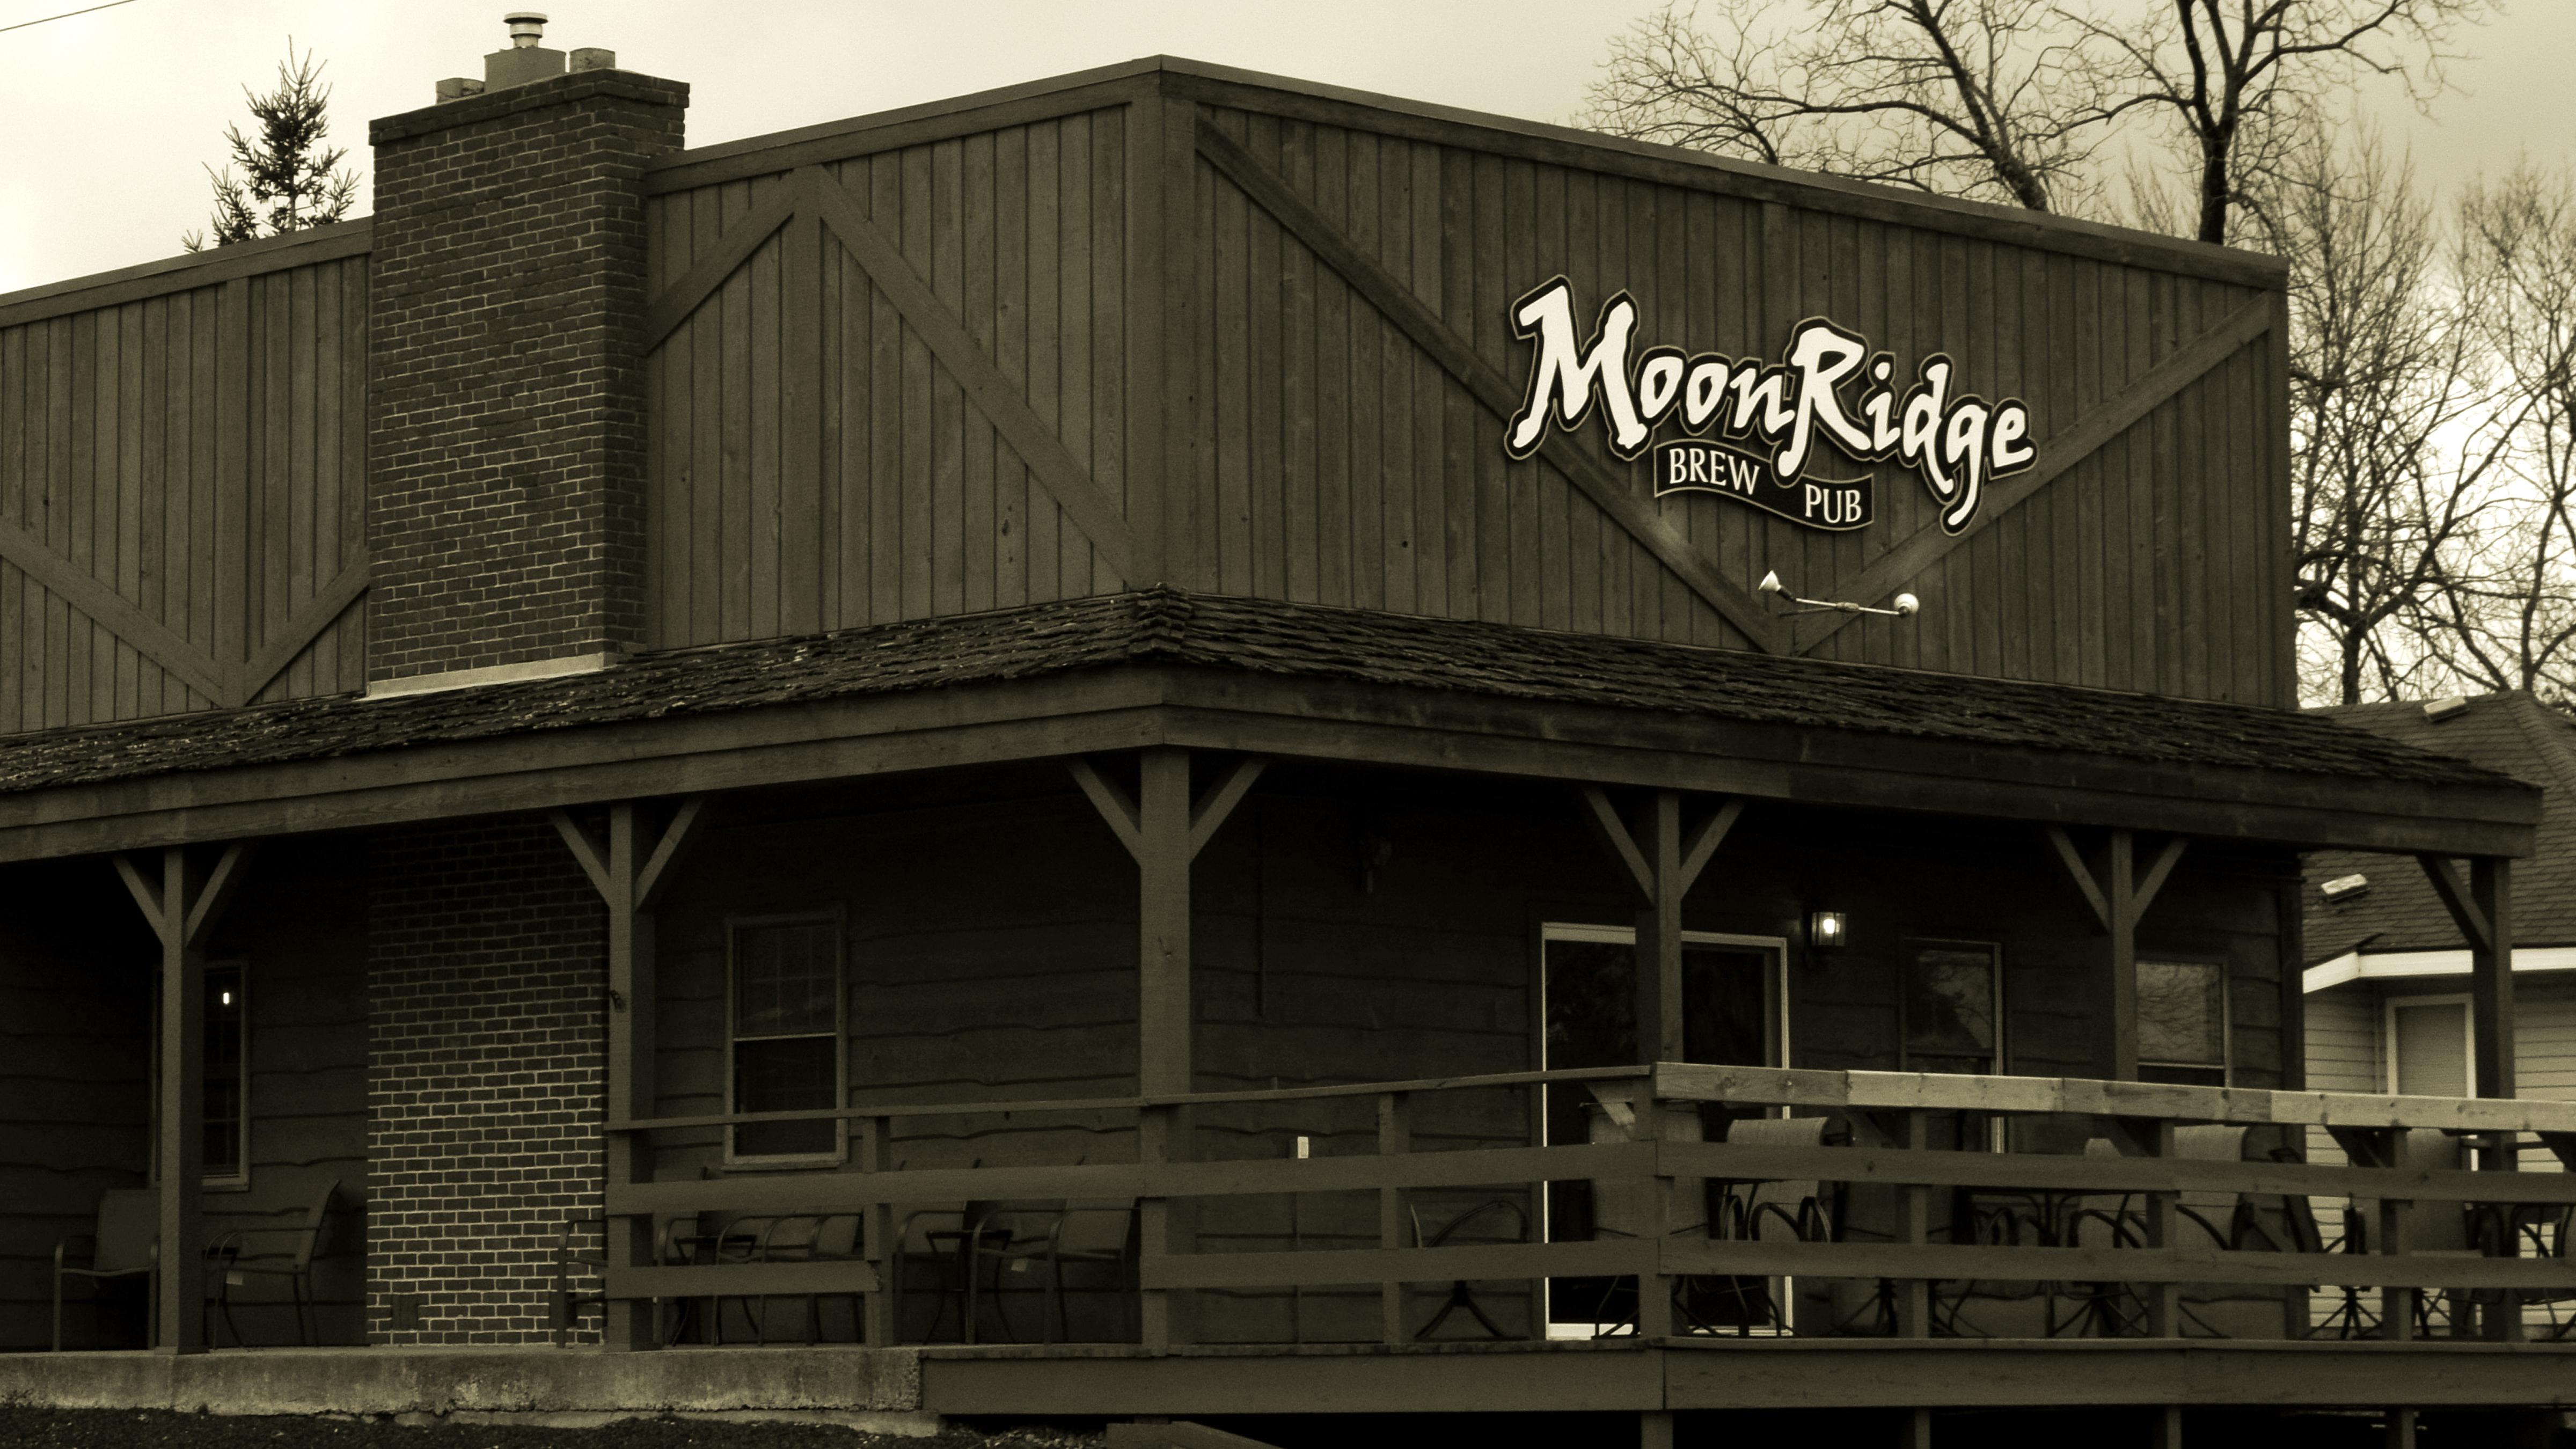 Moonridge2